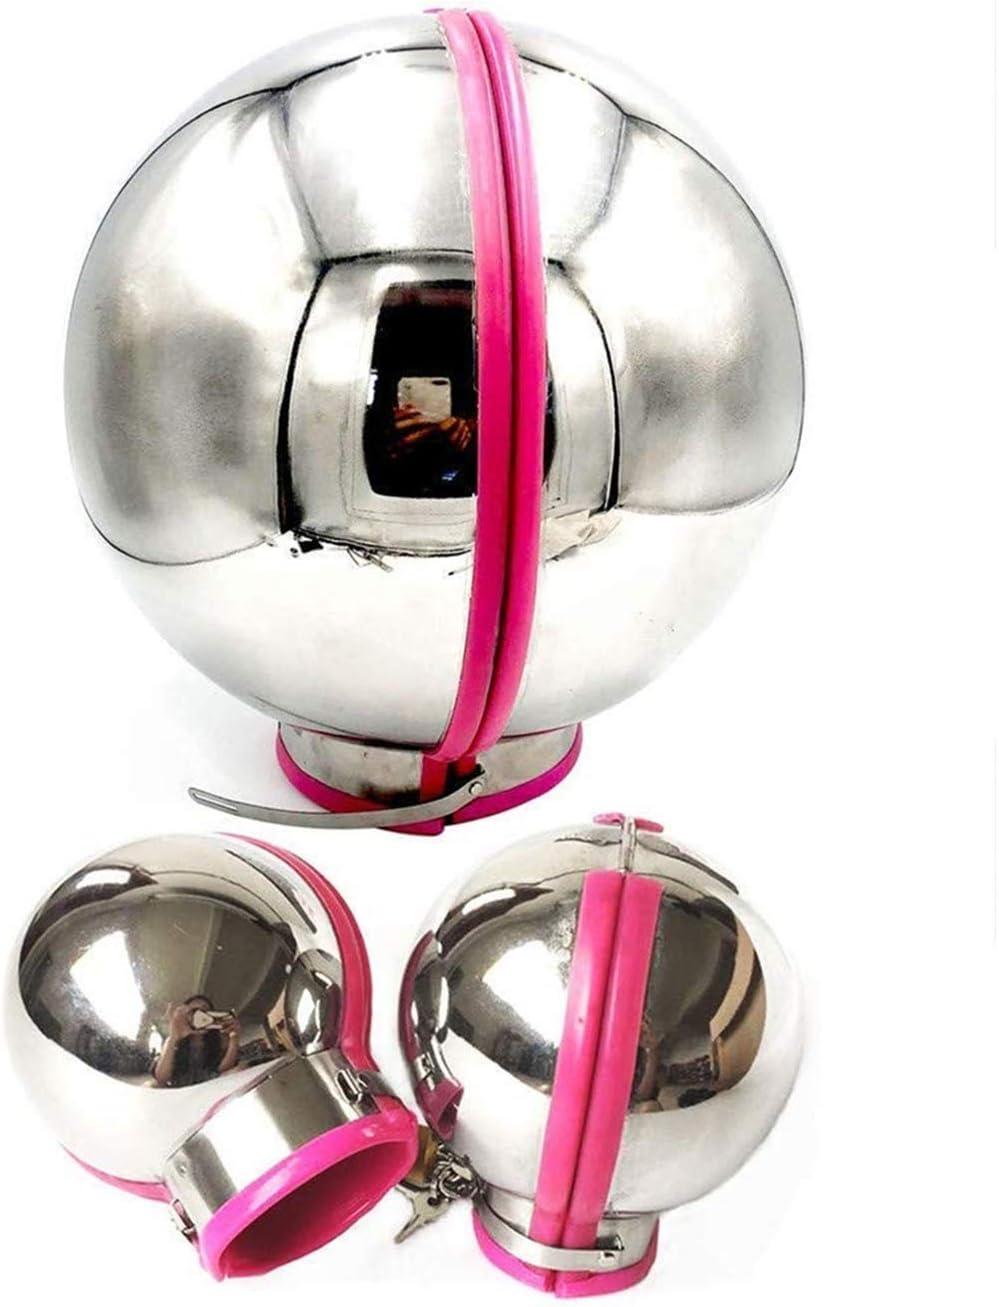 LI ランキング総合1位 yuan ランキング総合1位 Stainless Steel Bondage Metal Ball Helmet+Handcuffs Set